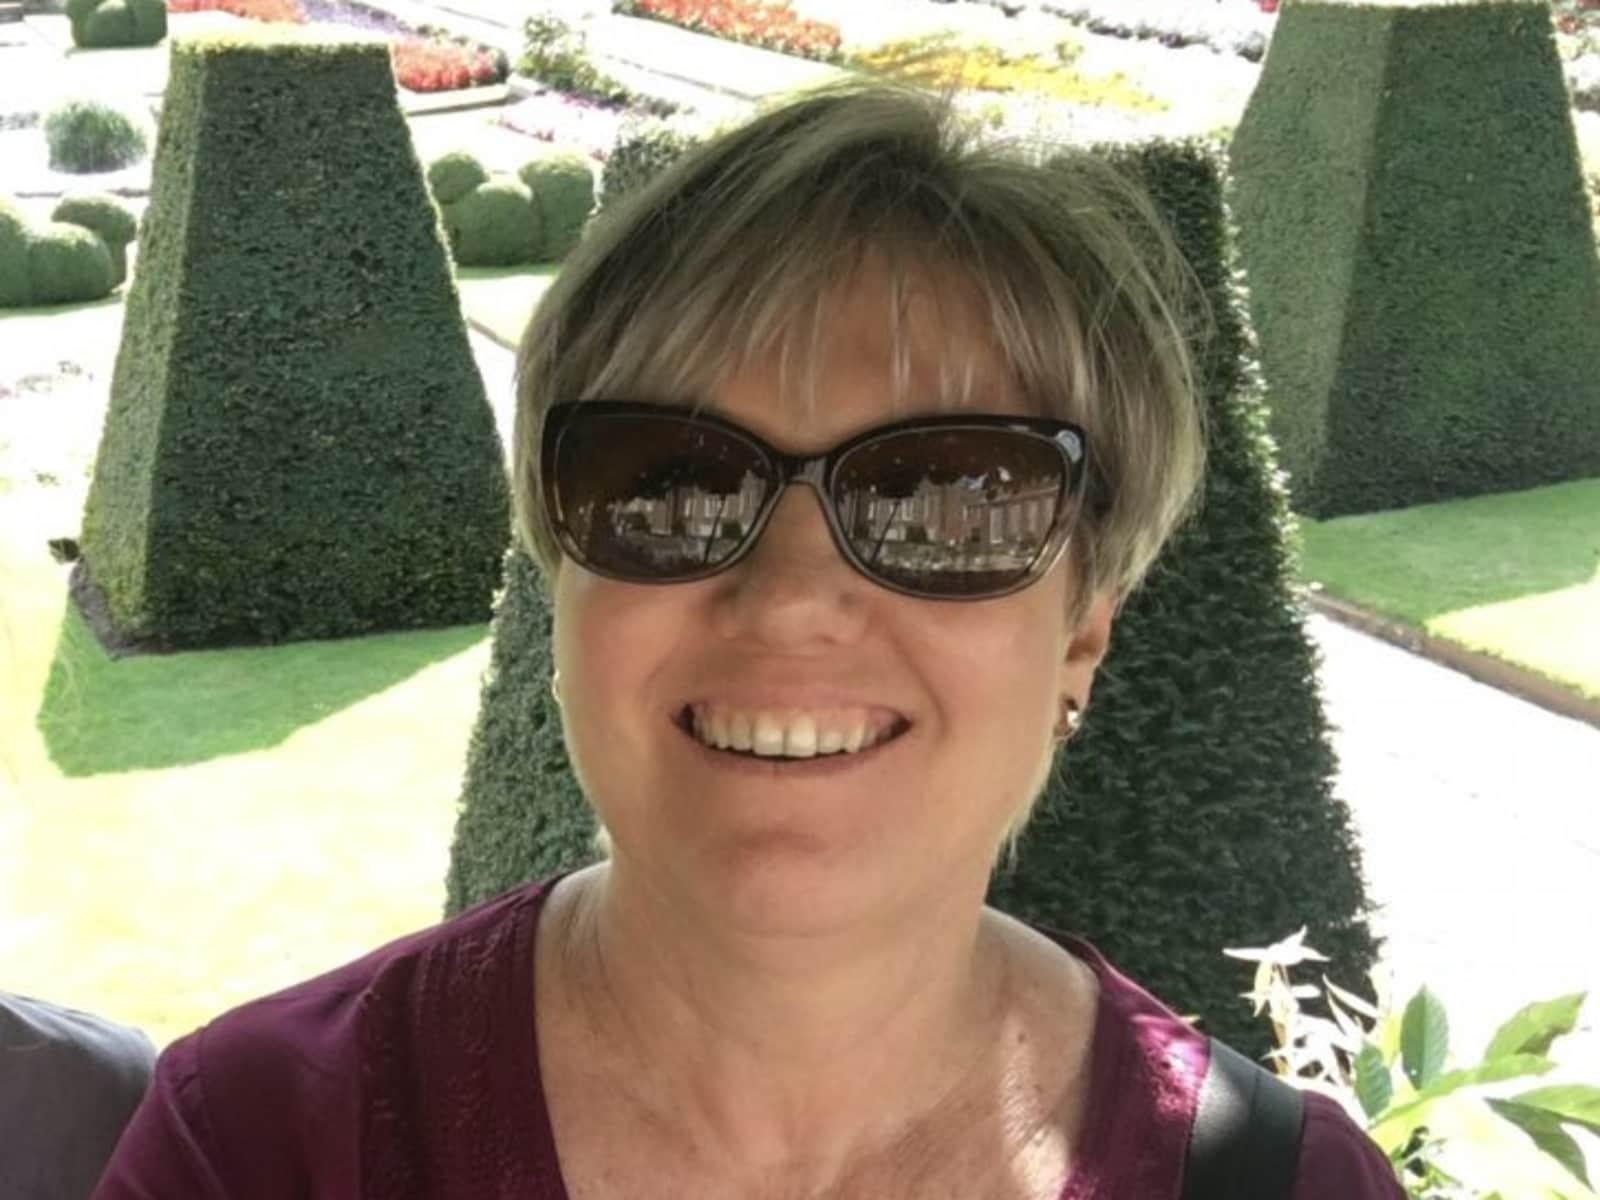 Paula from North Rothbury, New South Wales, Australia